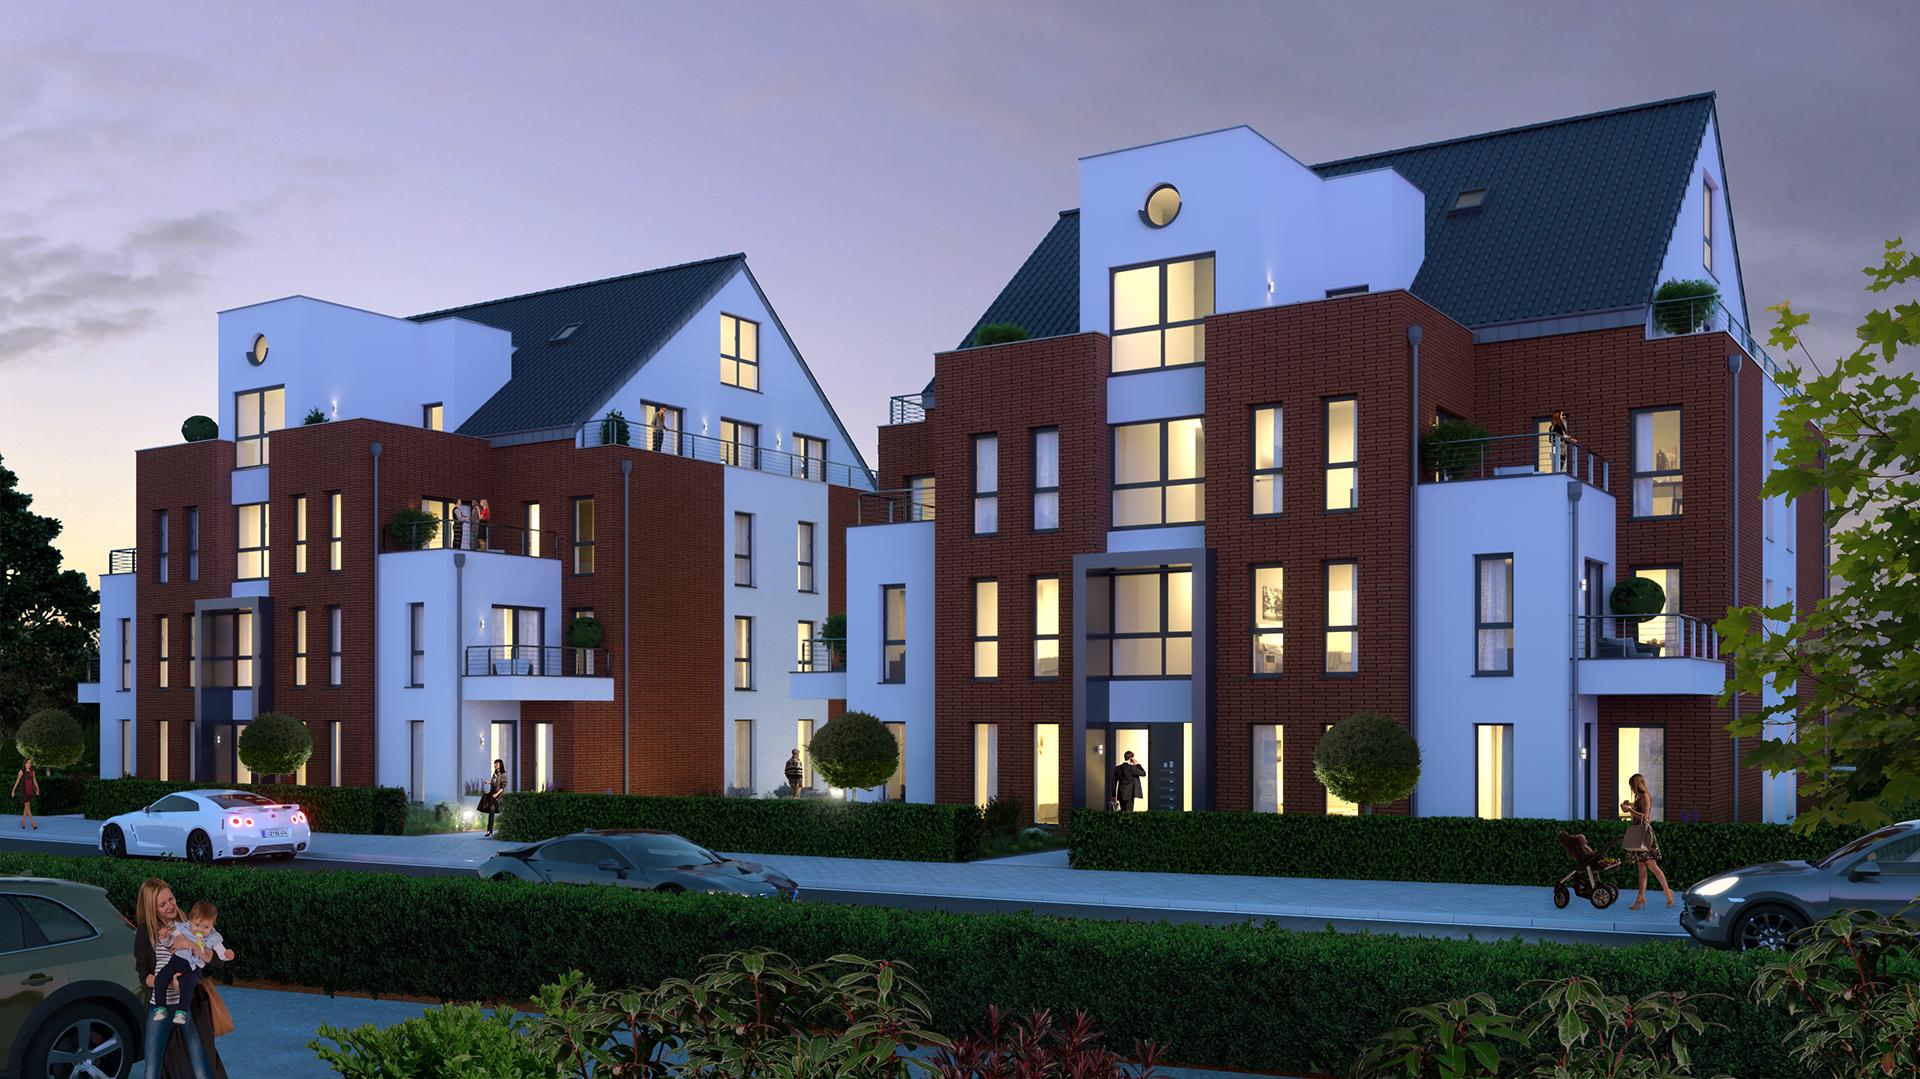 Mehrfamilienhaus Visualisierung